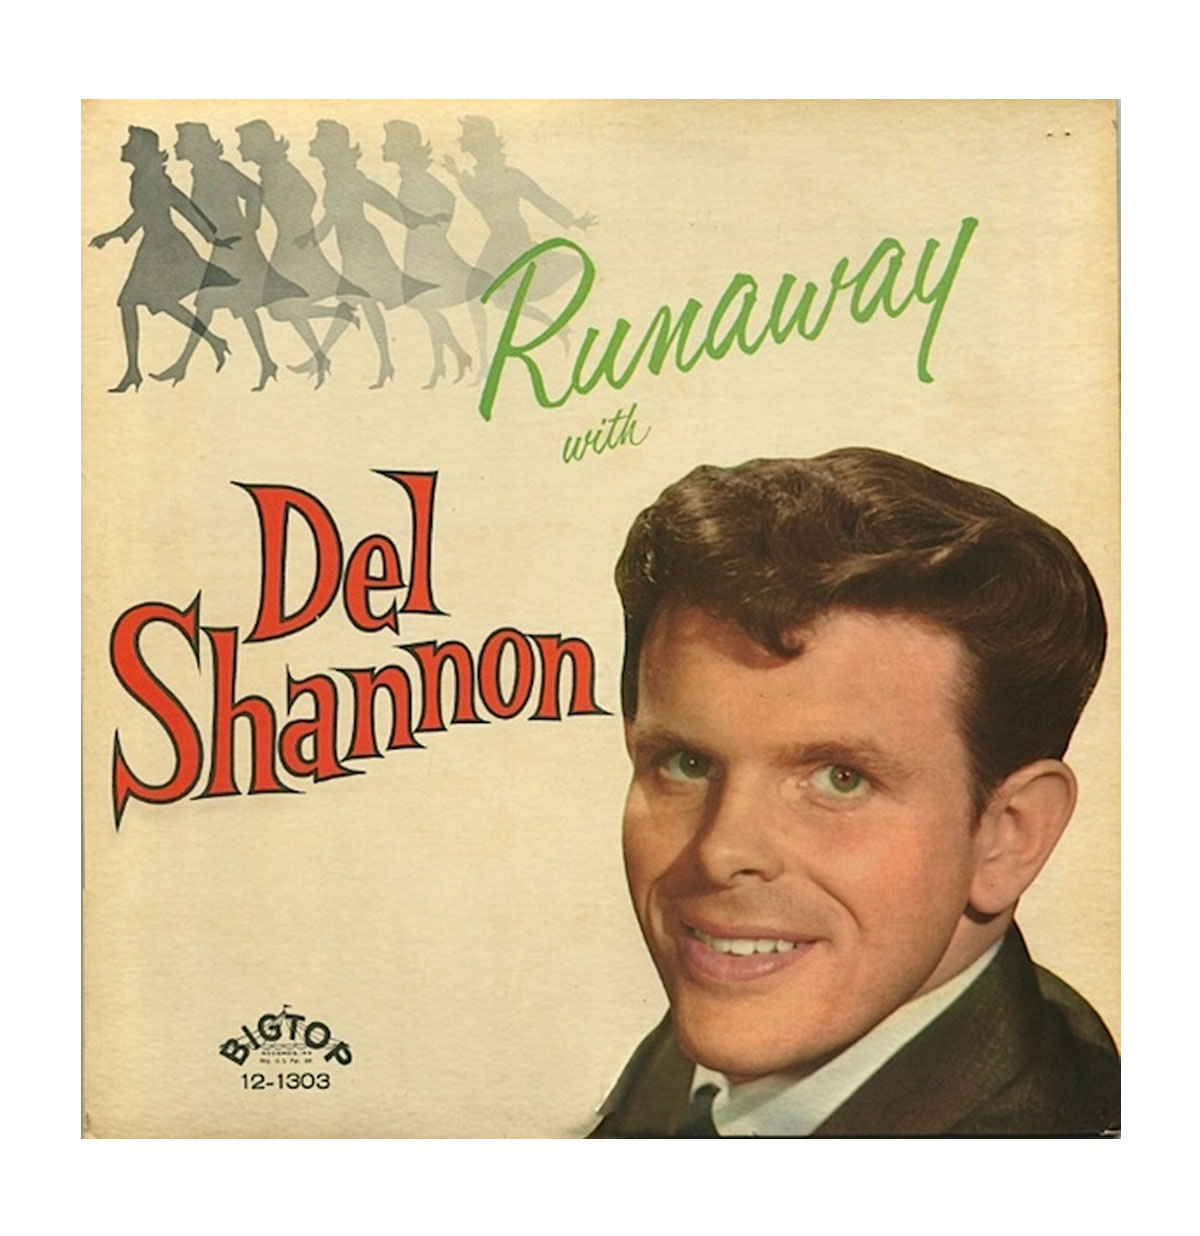 Del Shannon - Runaway With Del Shannon LP